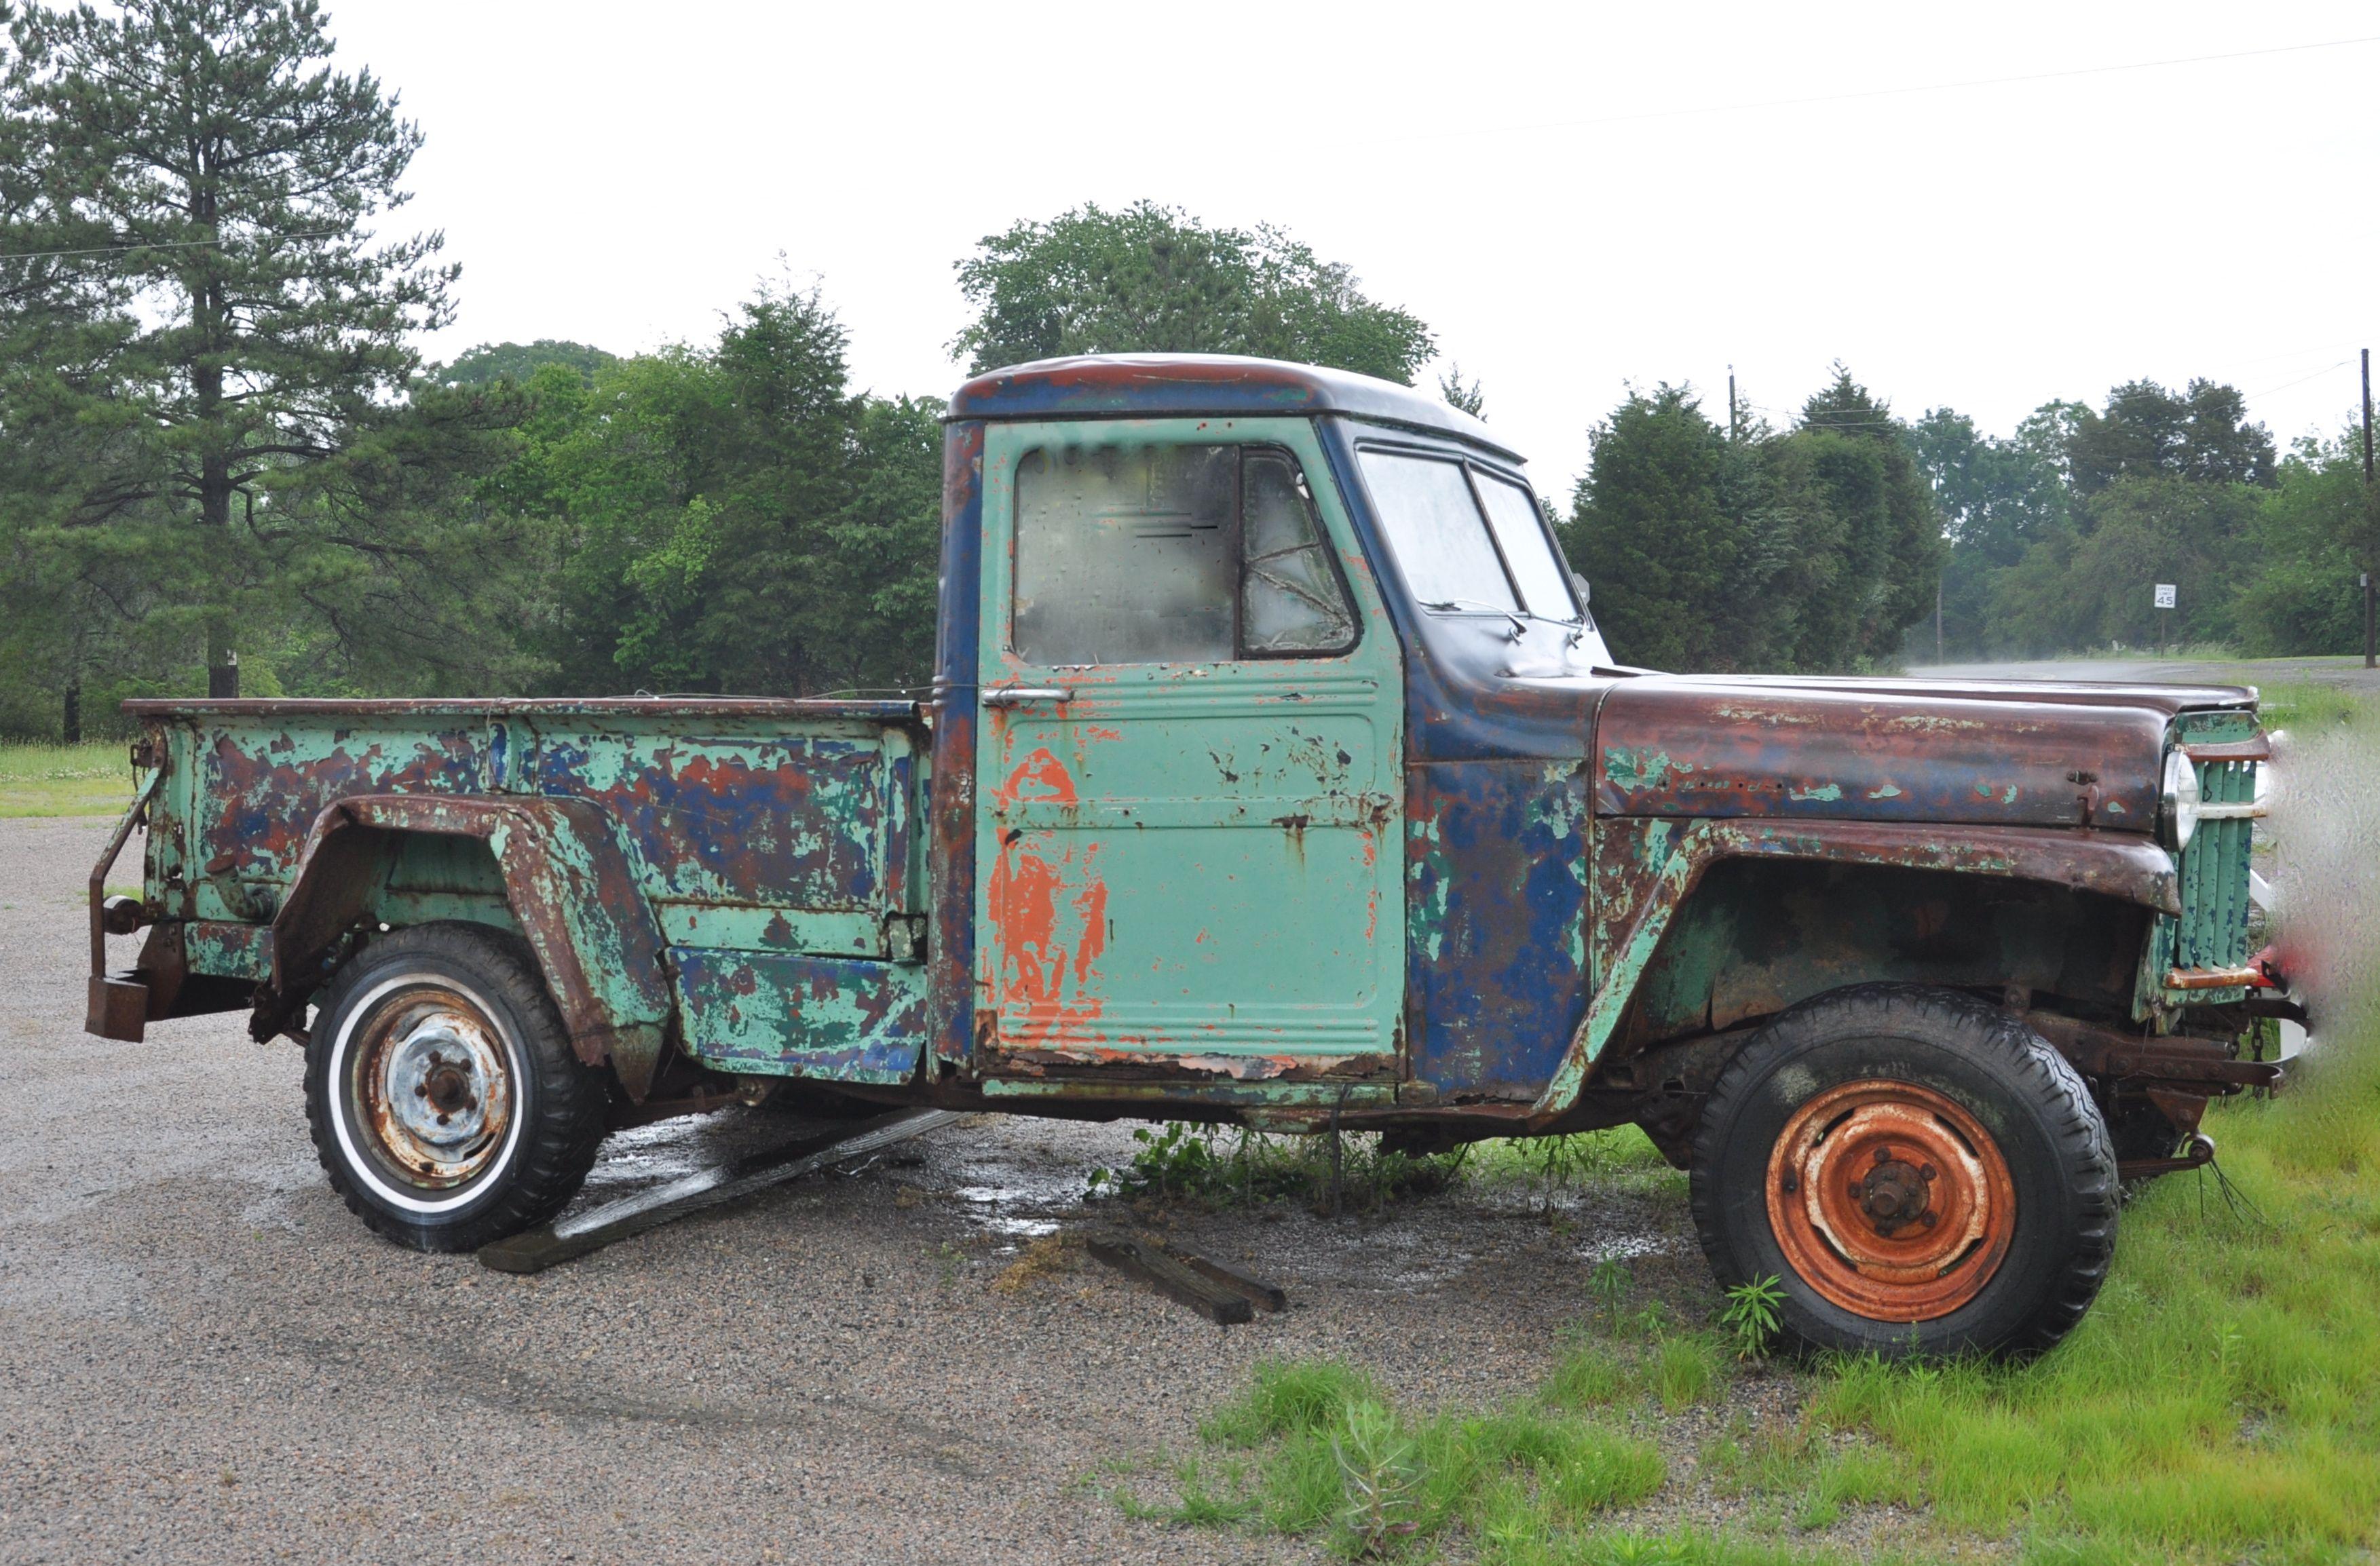 Another Old Truck In Essex County Va Trucks Monster Trucks Old Trucks